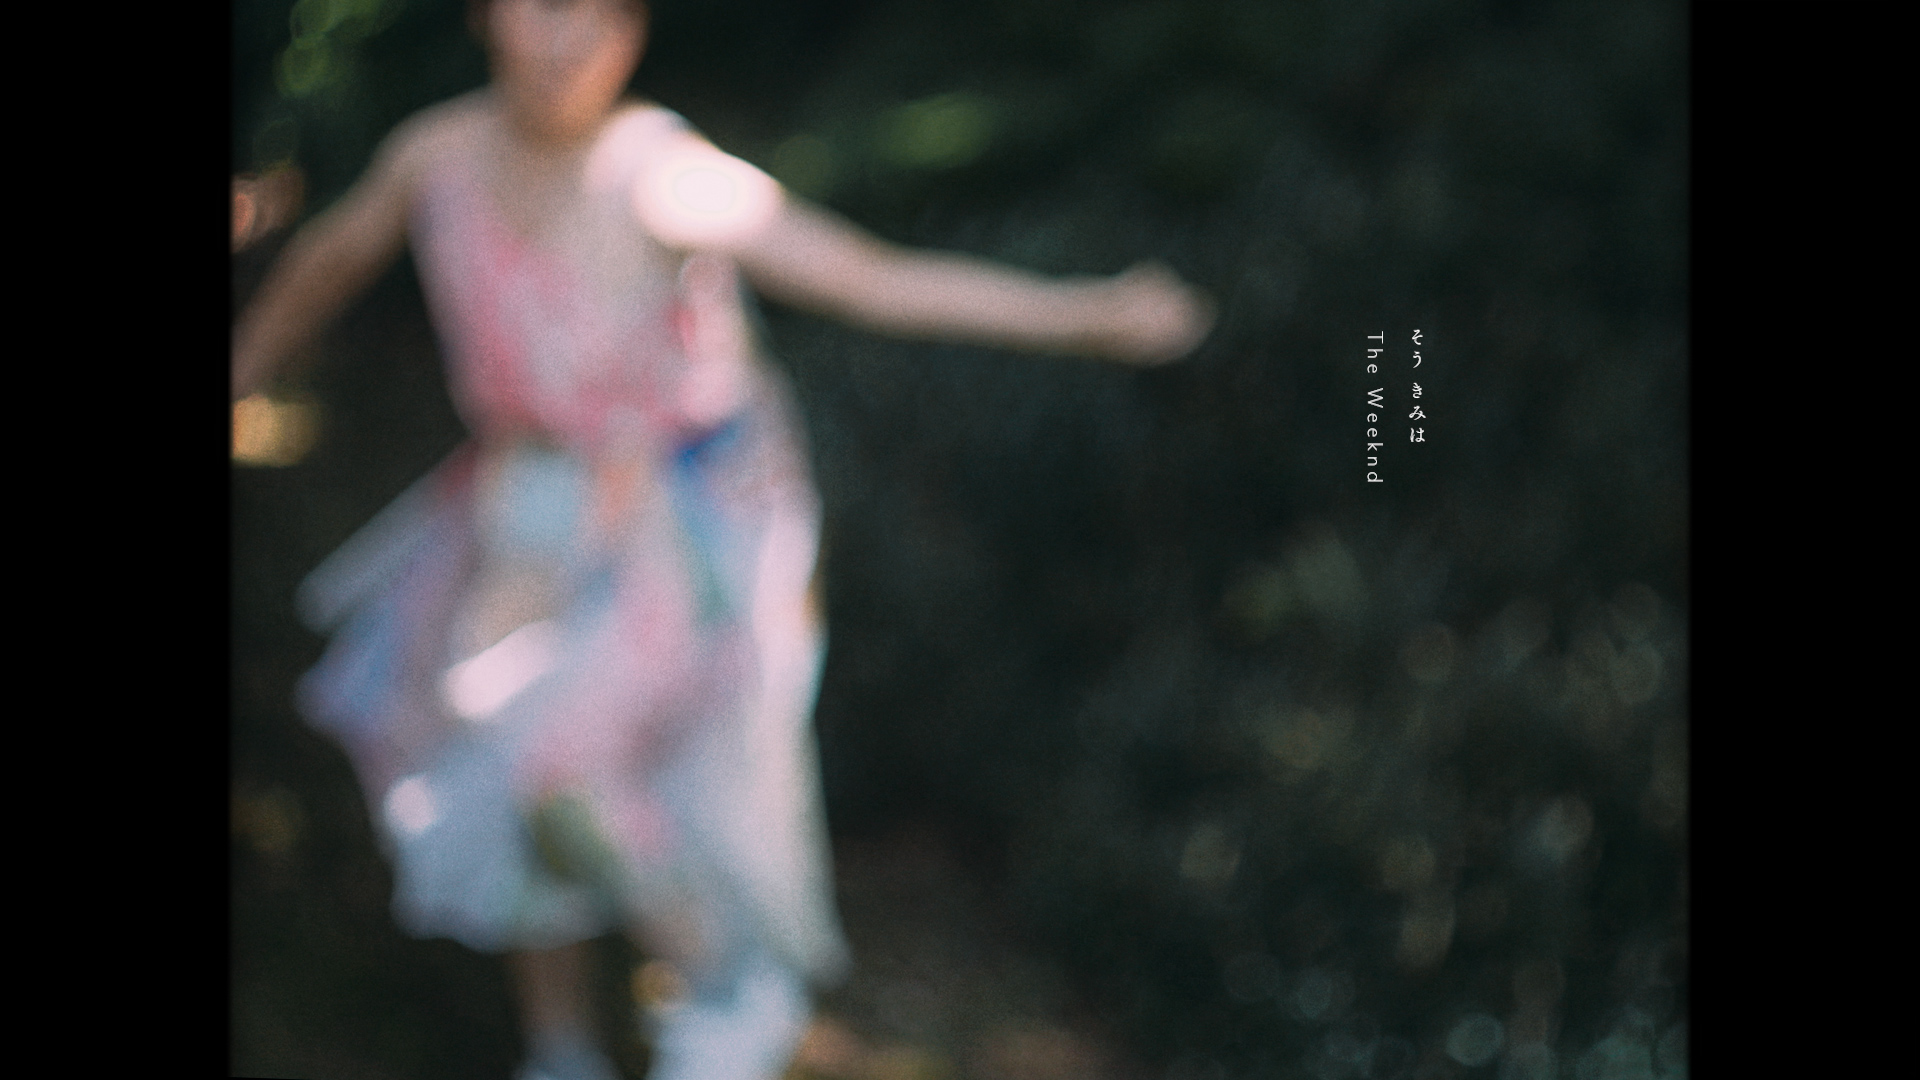 "NABOWA_My Heartbeat (Belong To You)feat. å±±ç""°ãªã¥.mp4.00_02_25_23.Still014.jpg"